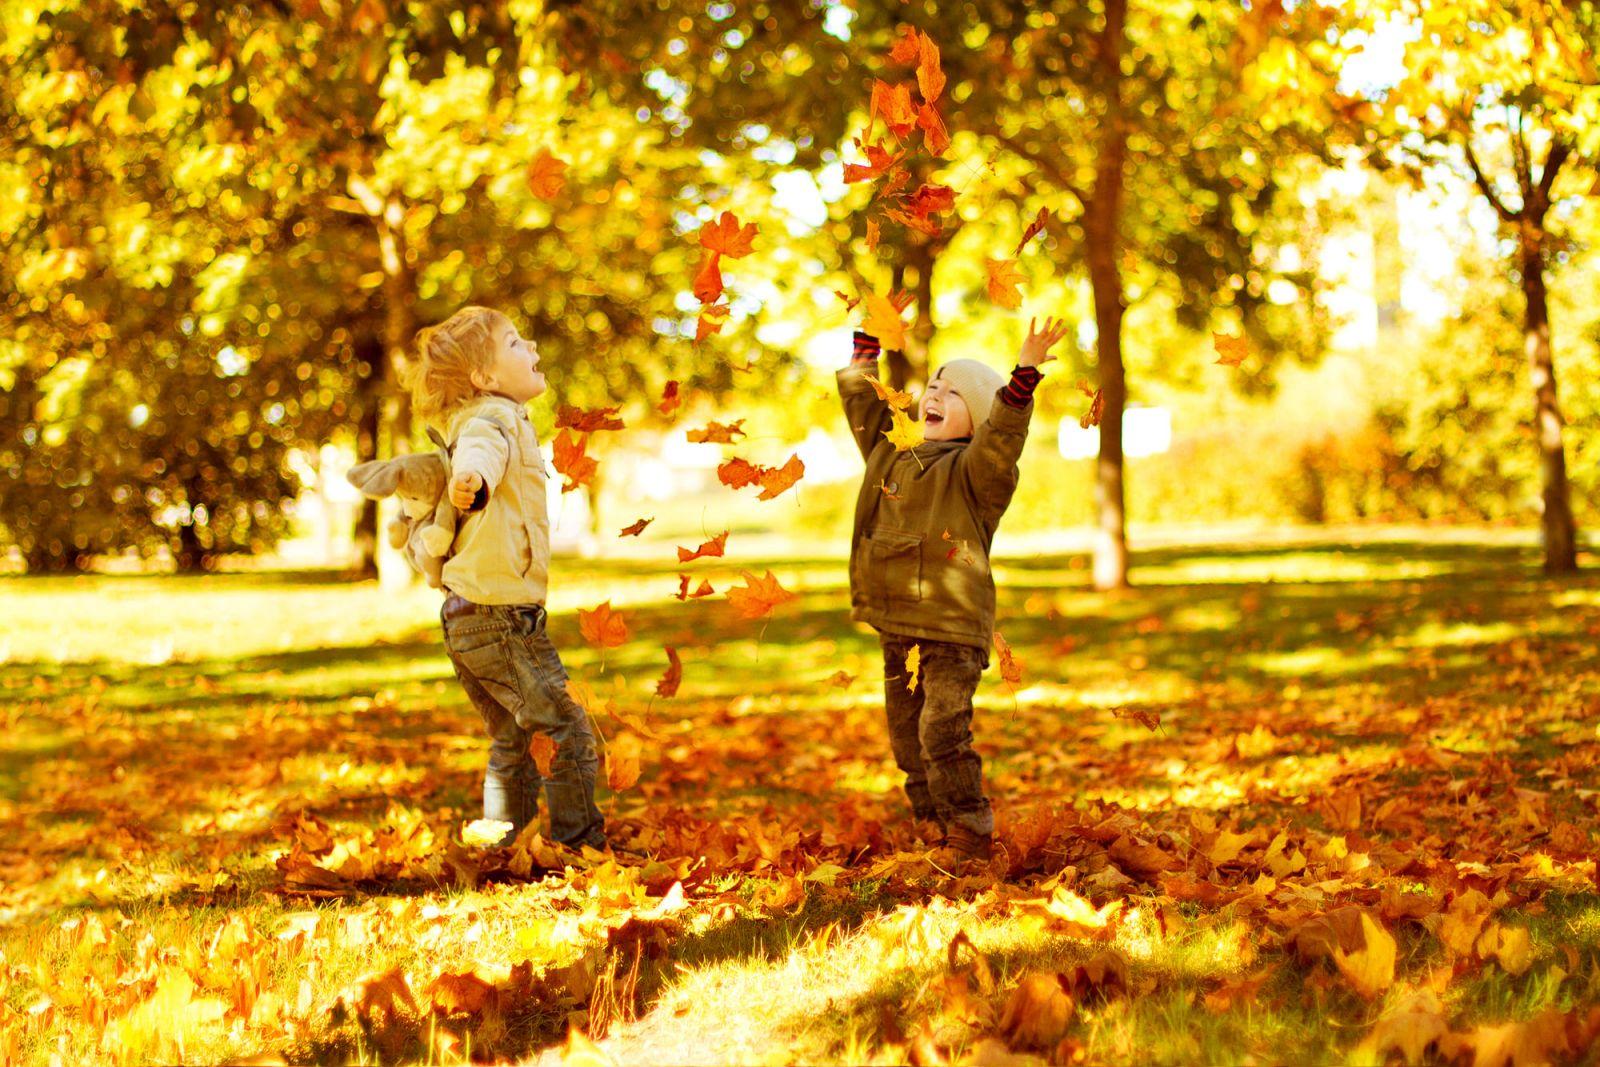 Картинки, картинки дети осенью играют